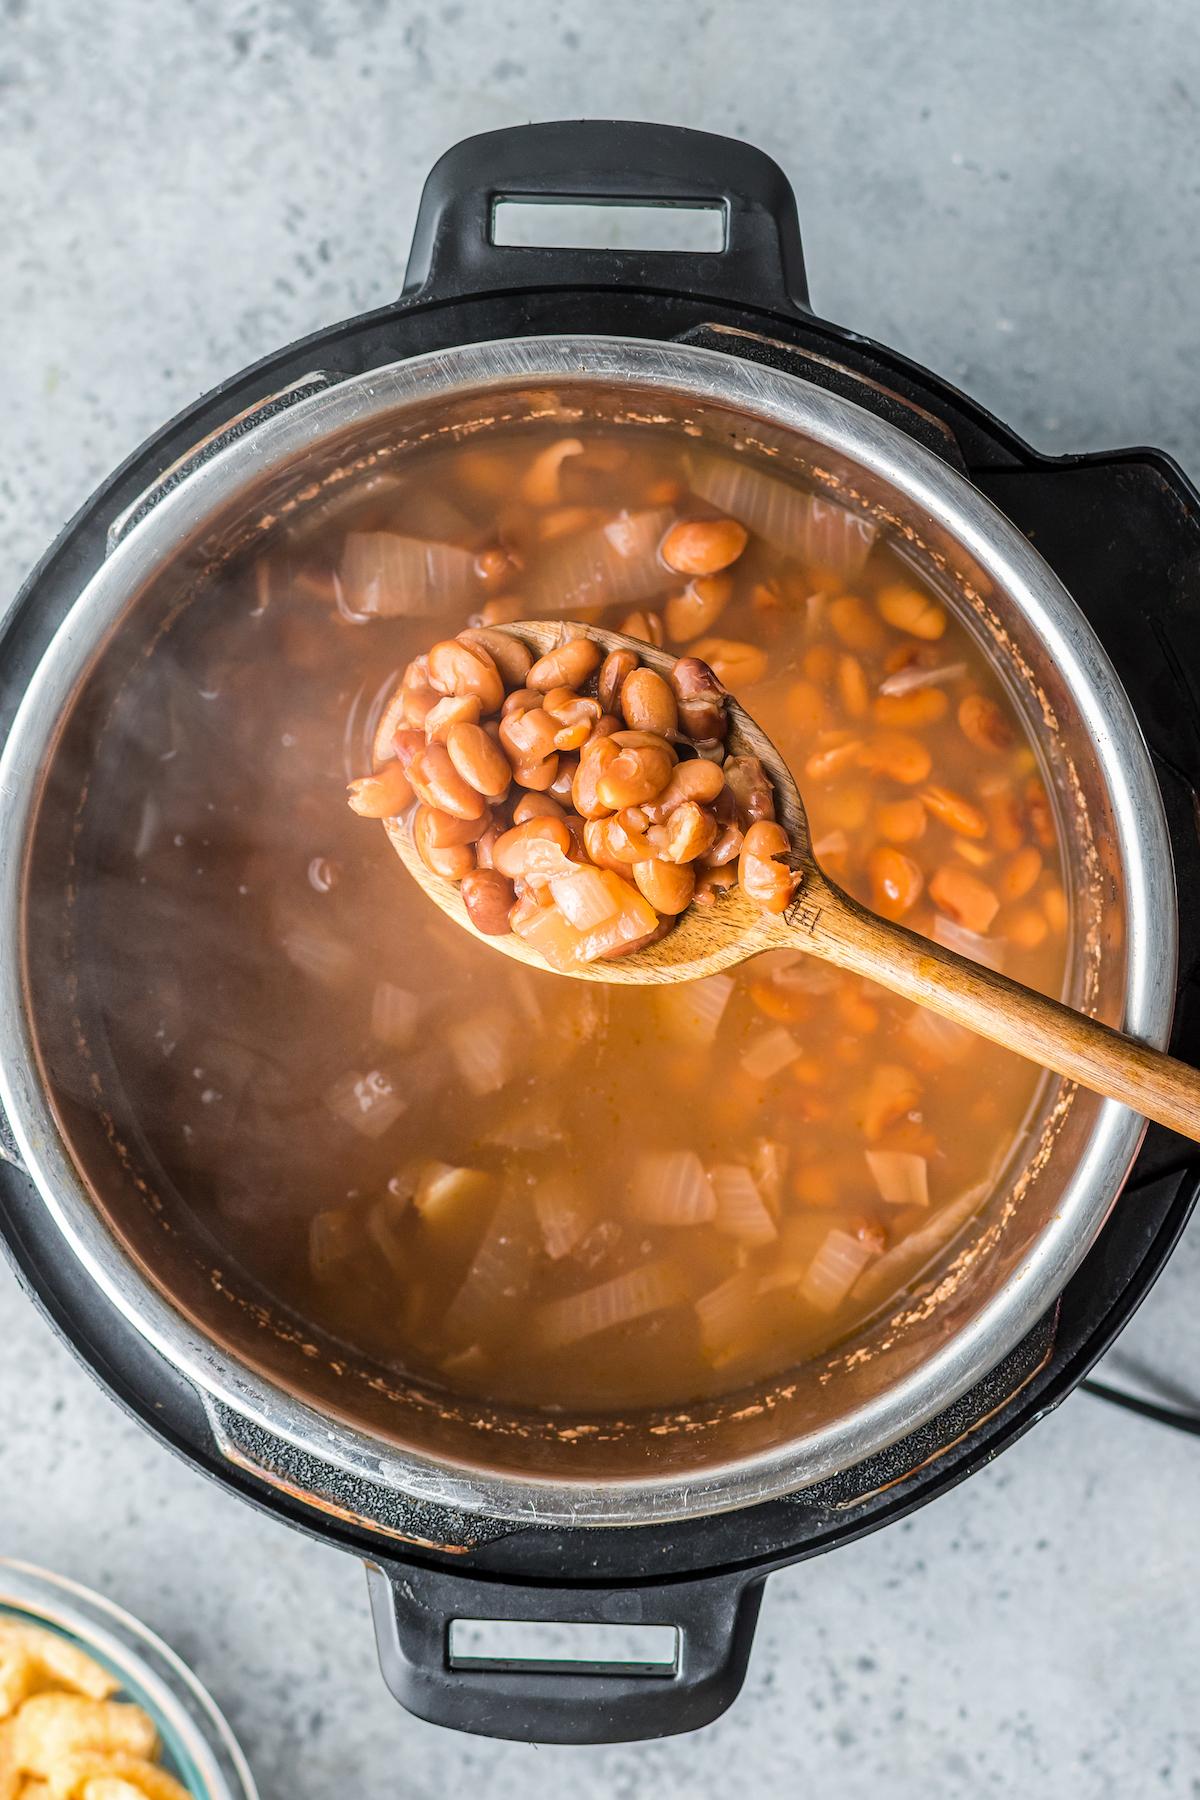 Instant pot full of charro beans stew.